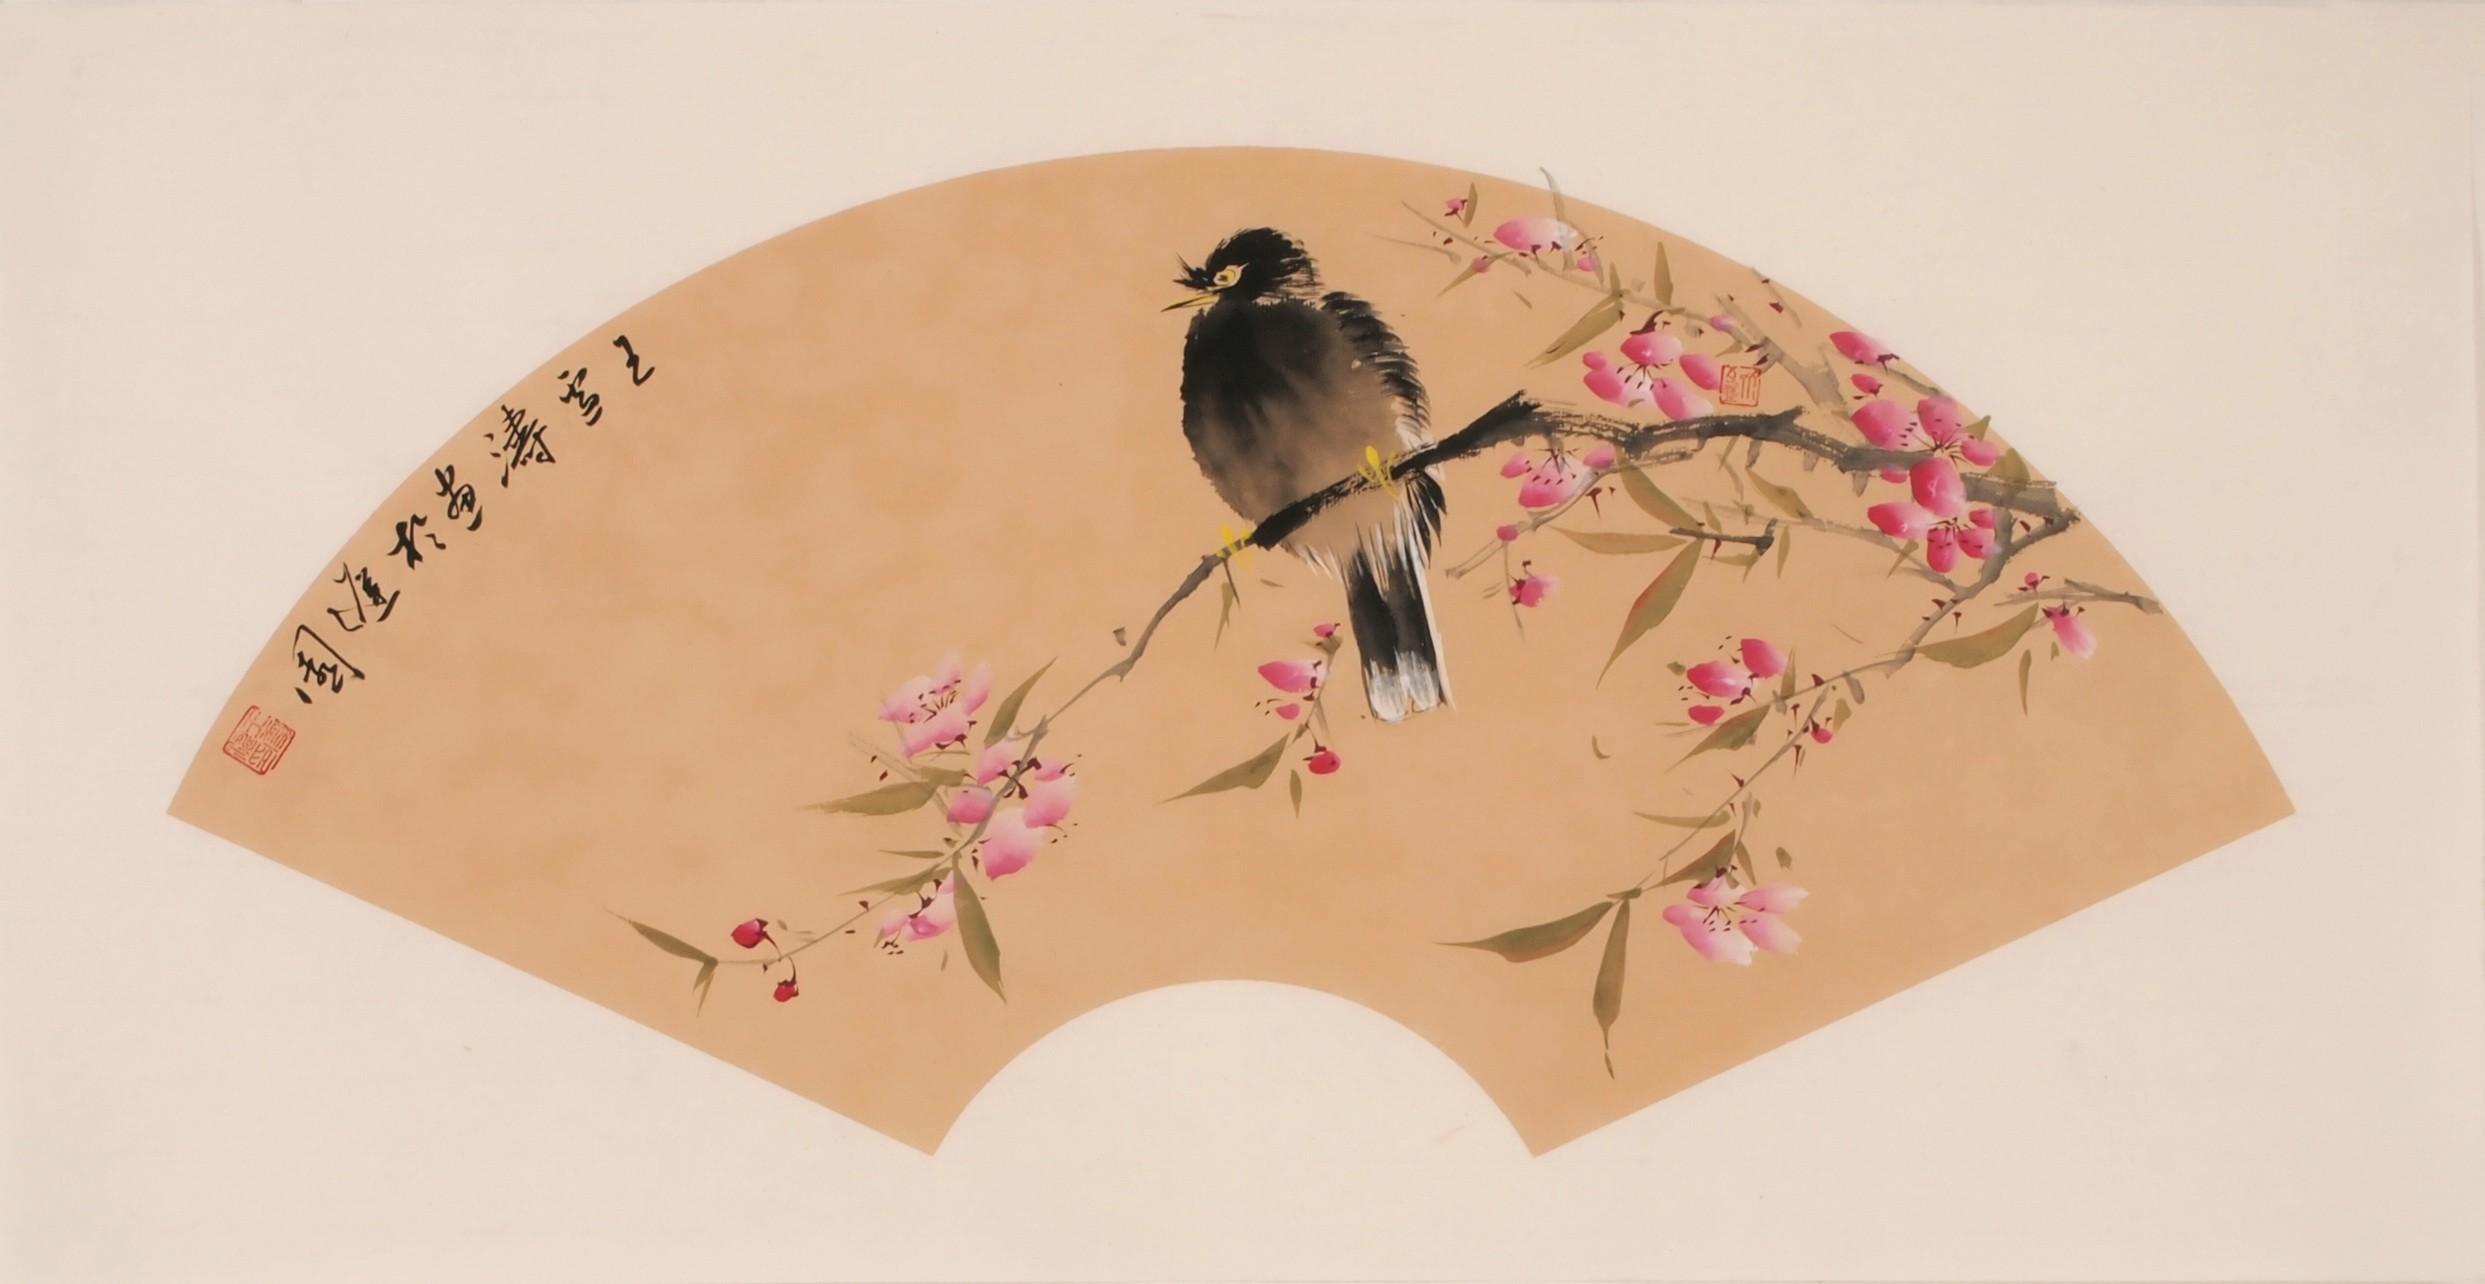 Starling - CNAG001895